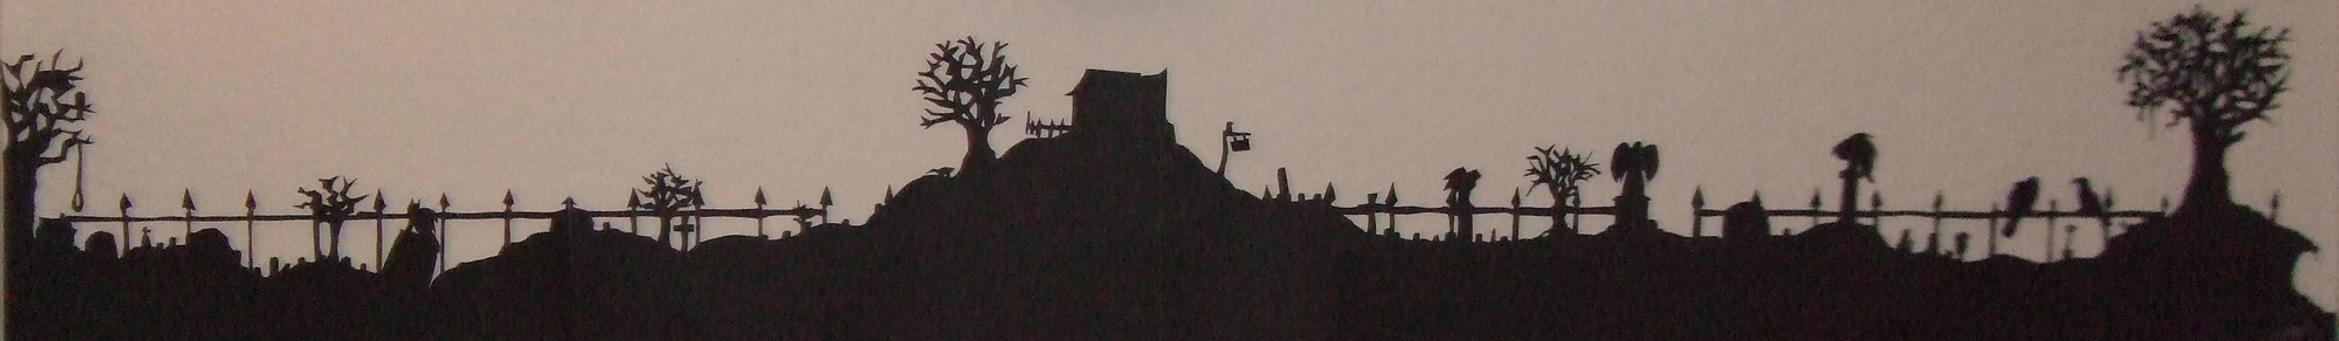 Halloween Banner by Silence-ofaDarkHeart